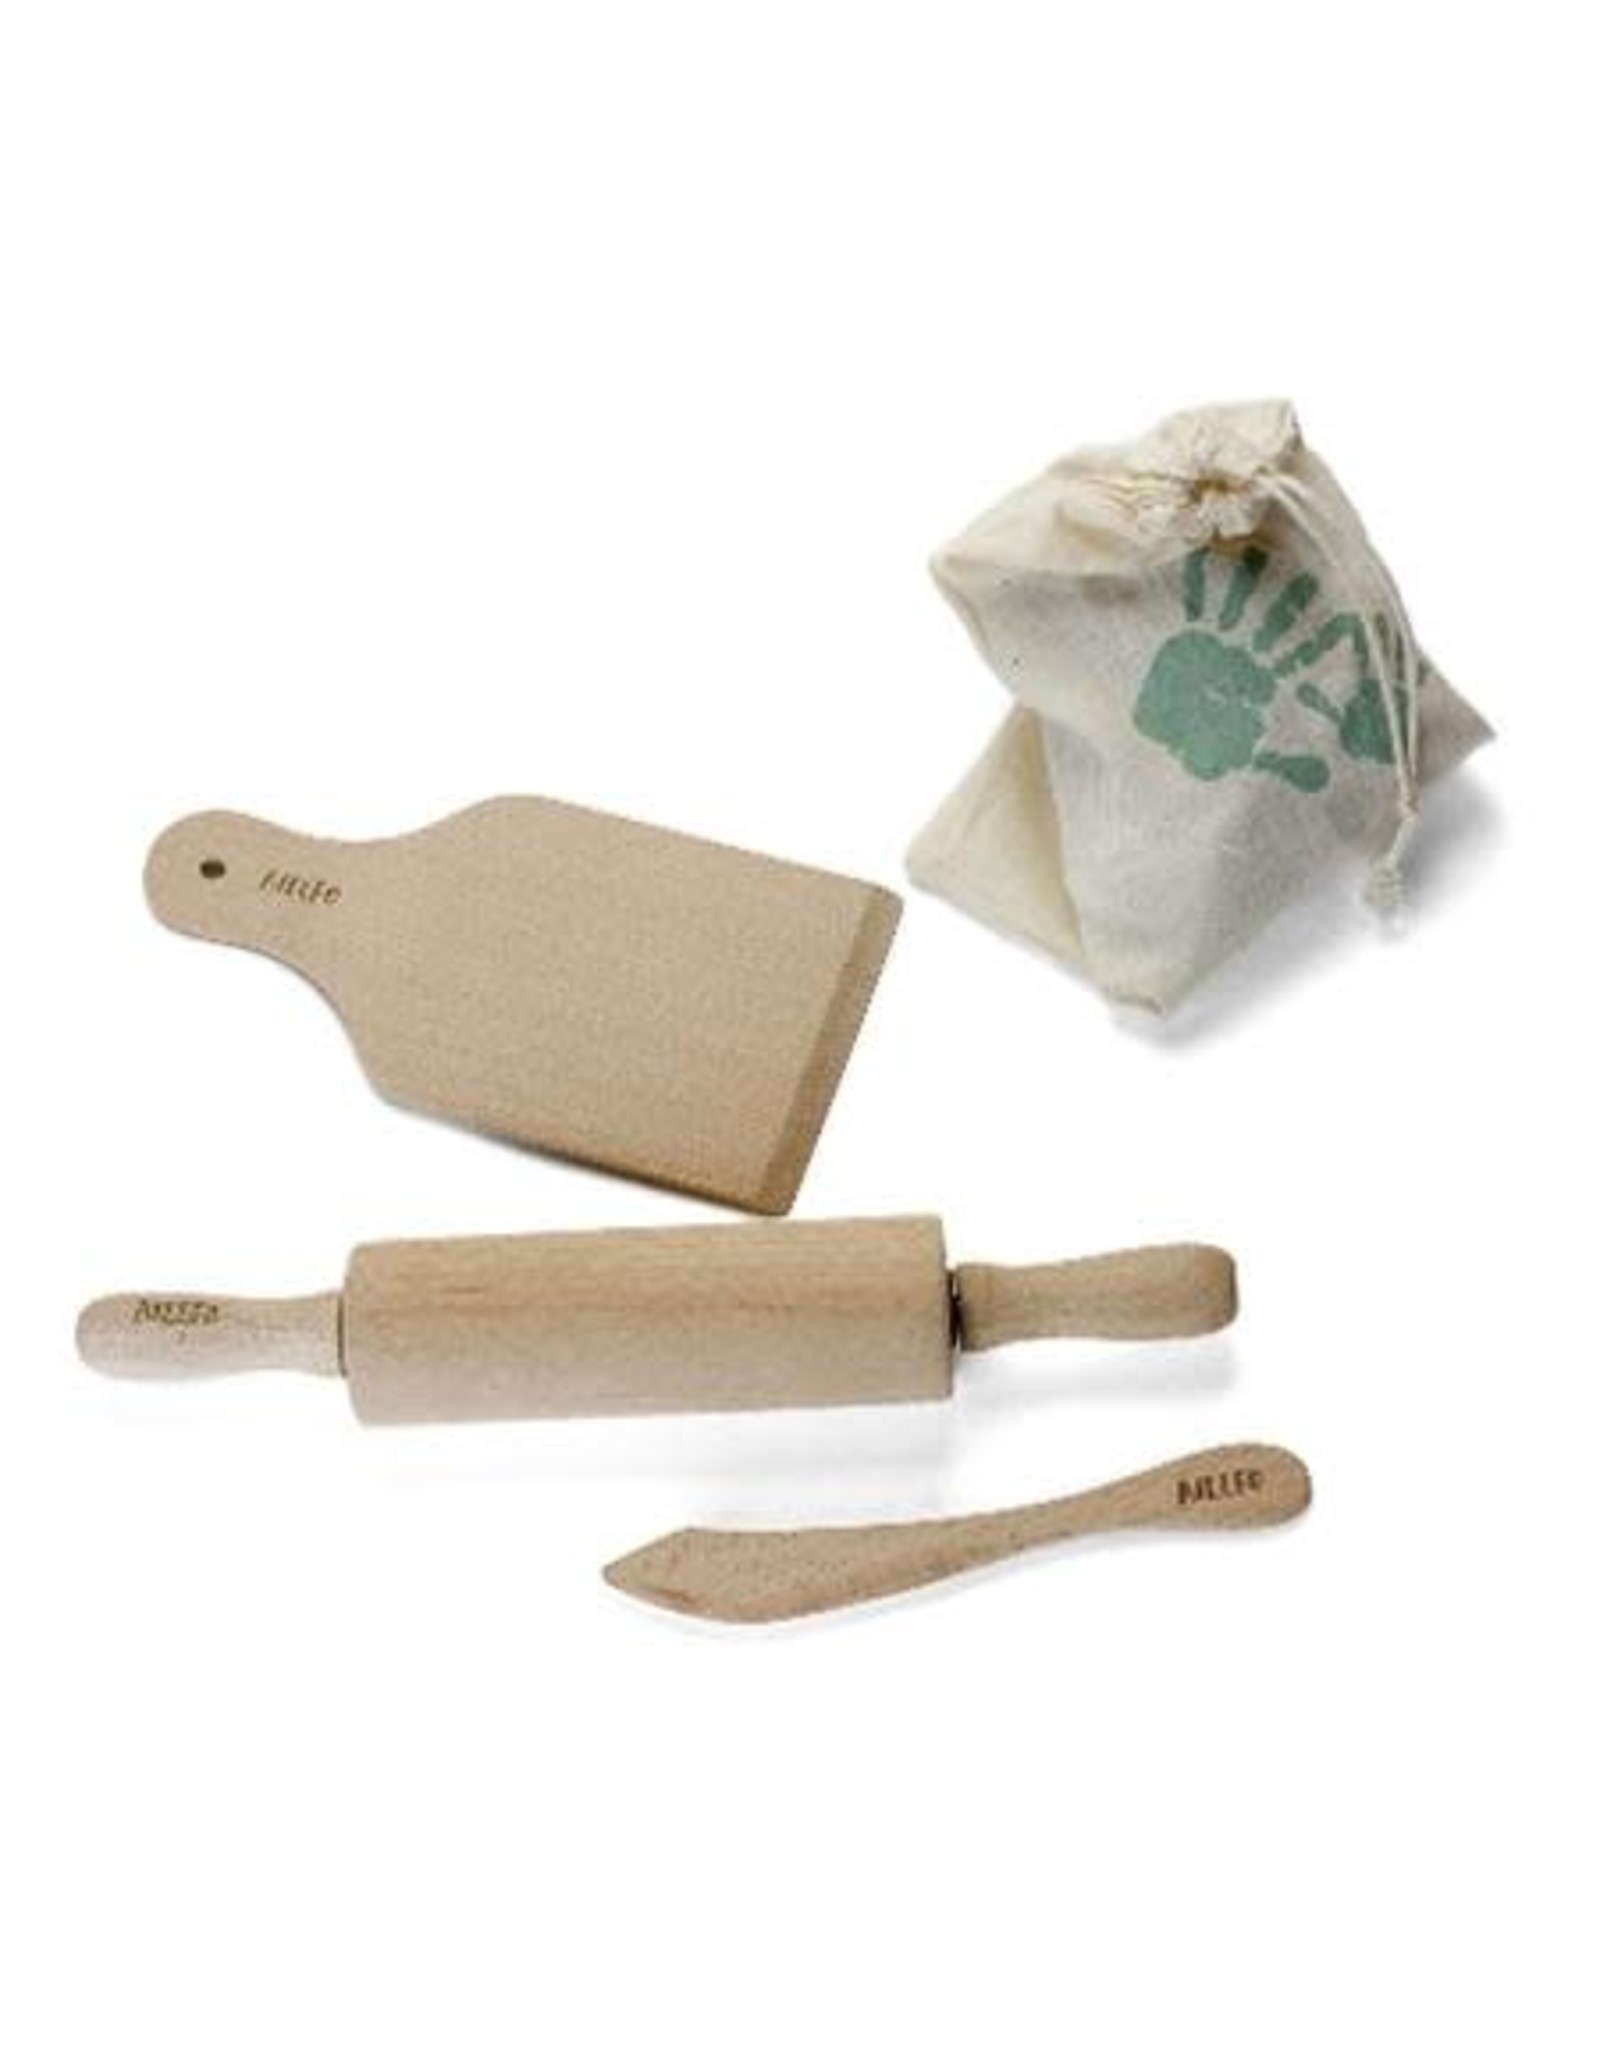 Ailefo Ailefo houten toolset voor klei